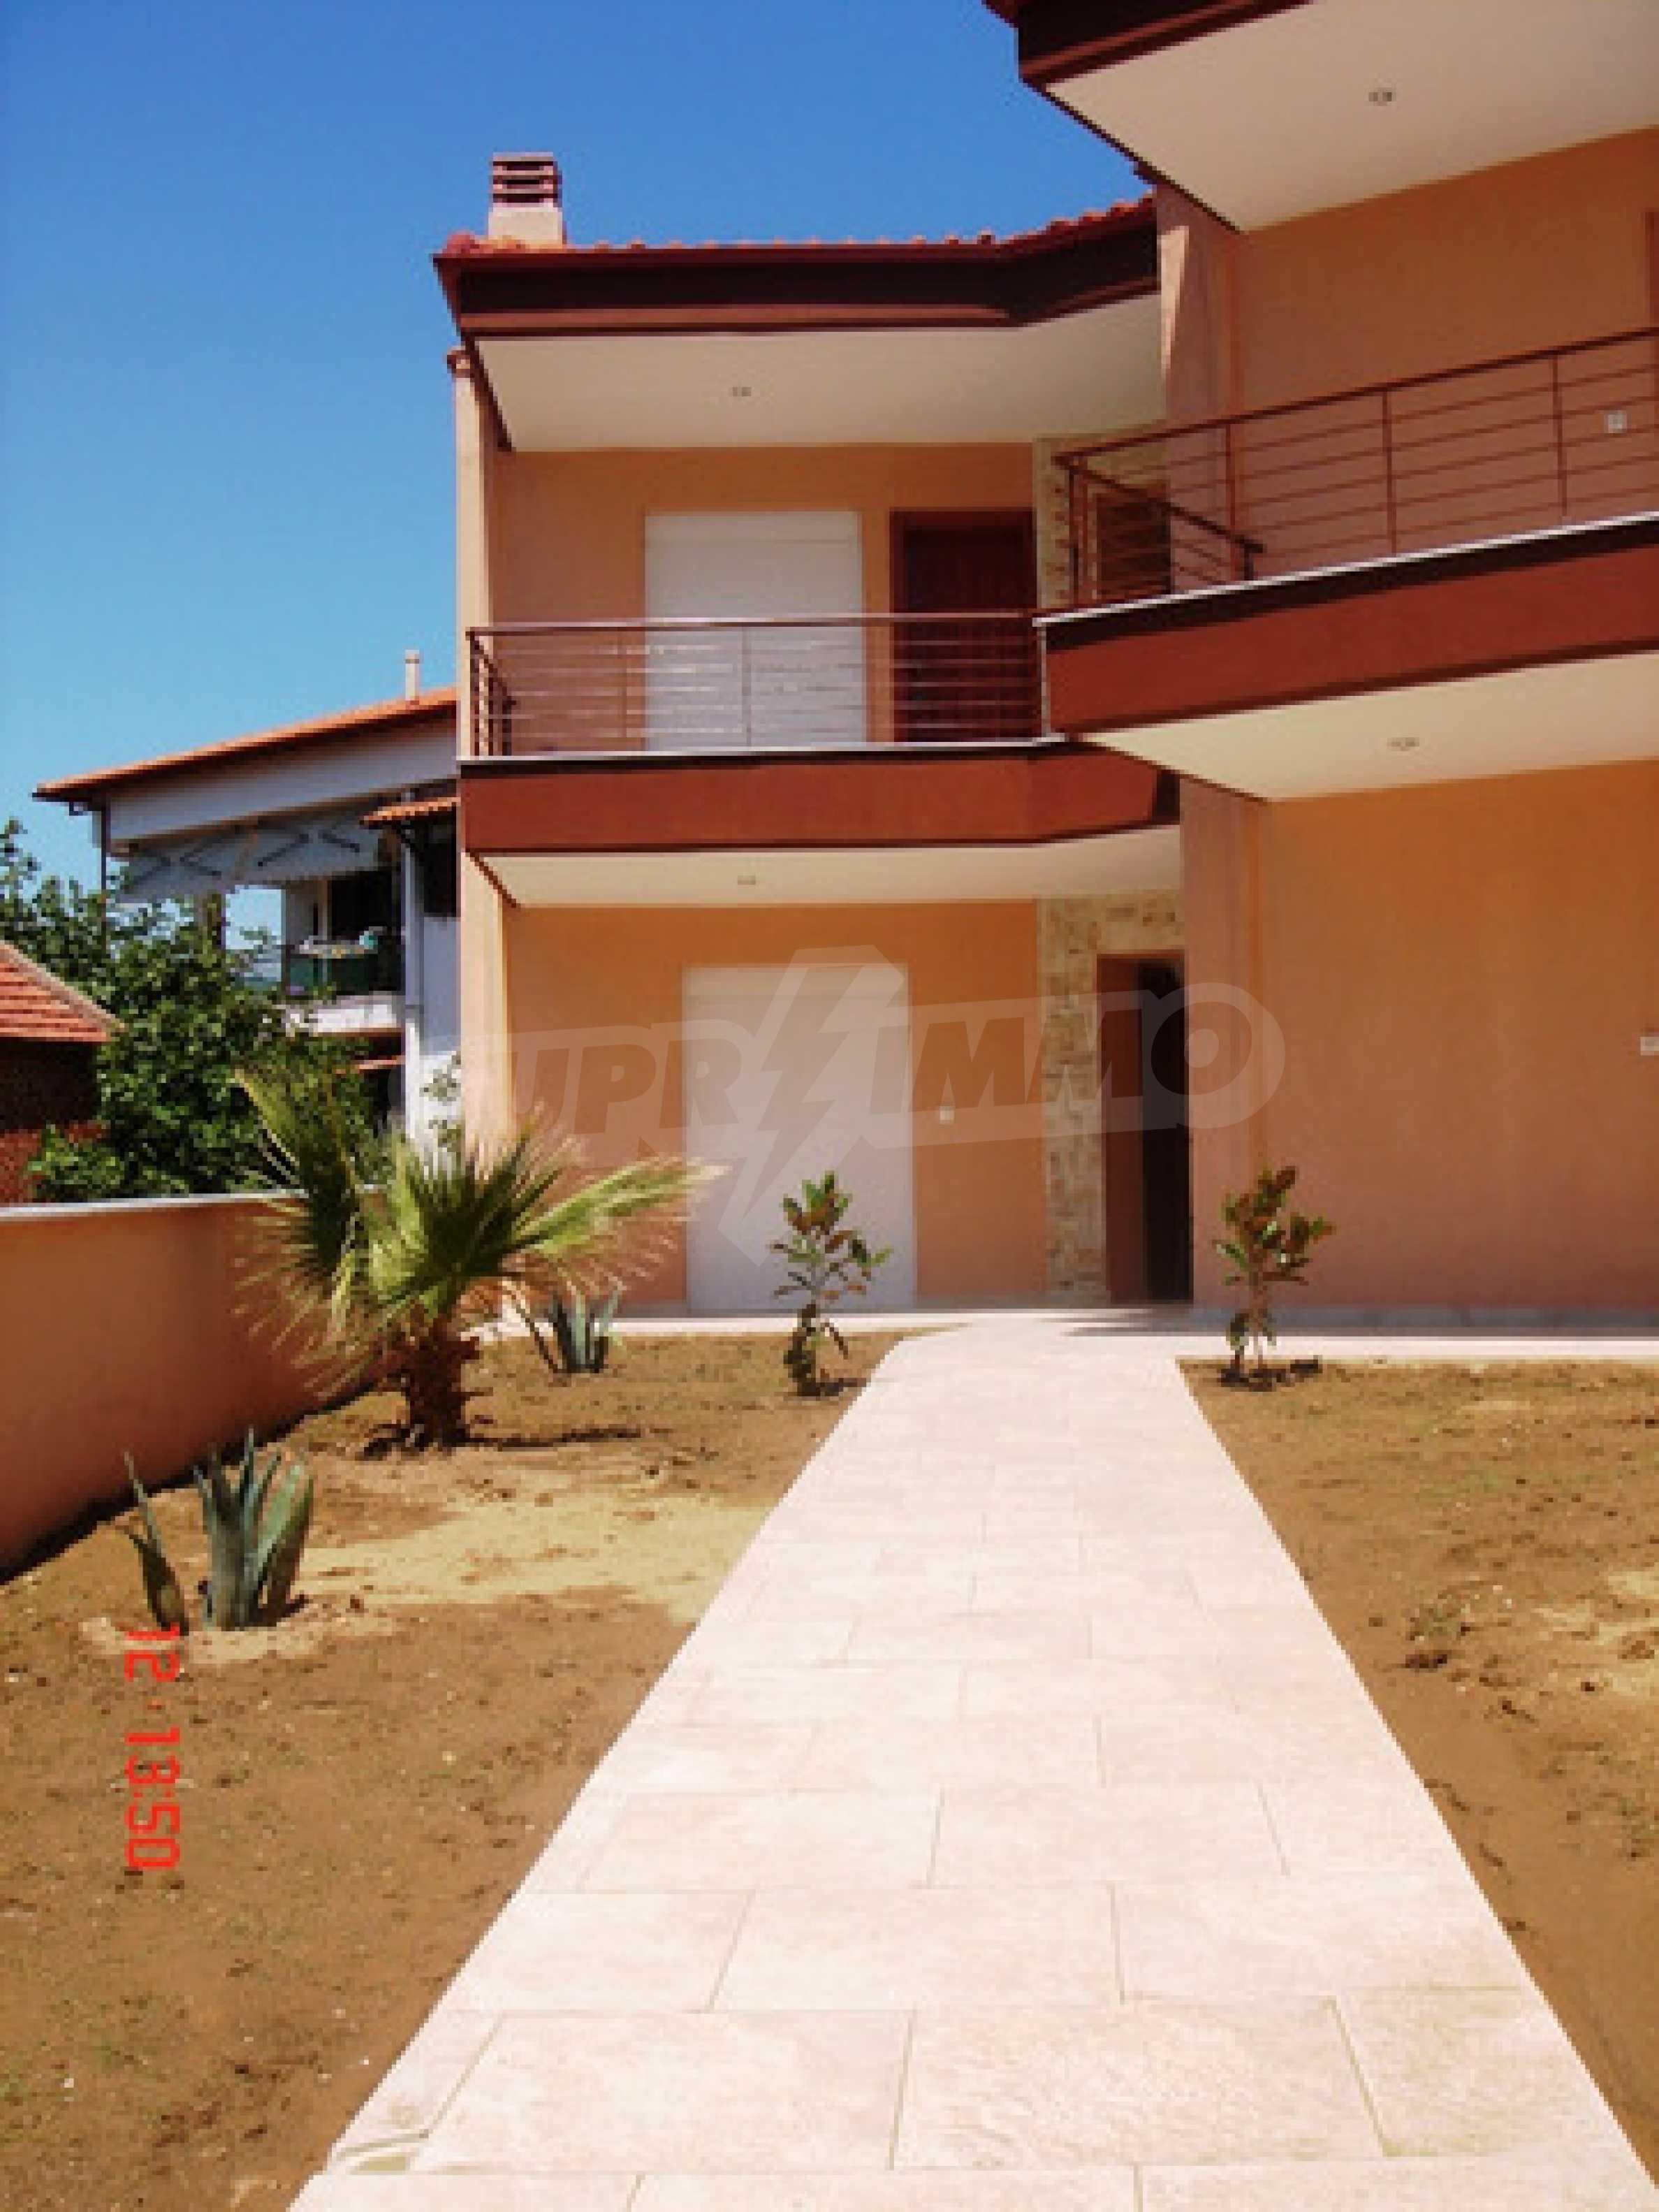 тристаен апартамент в Потидея, Касандра 8